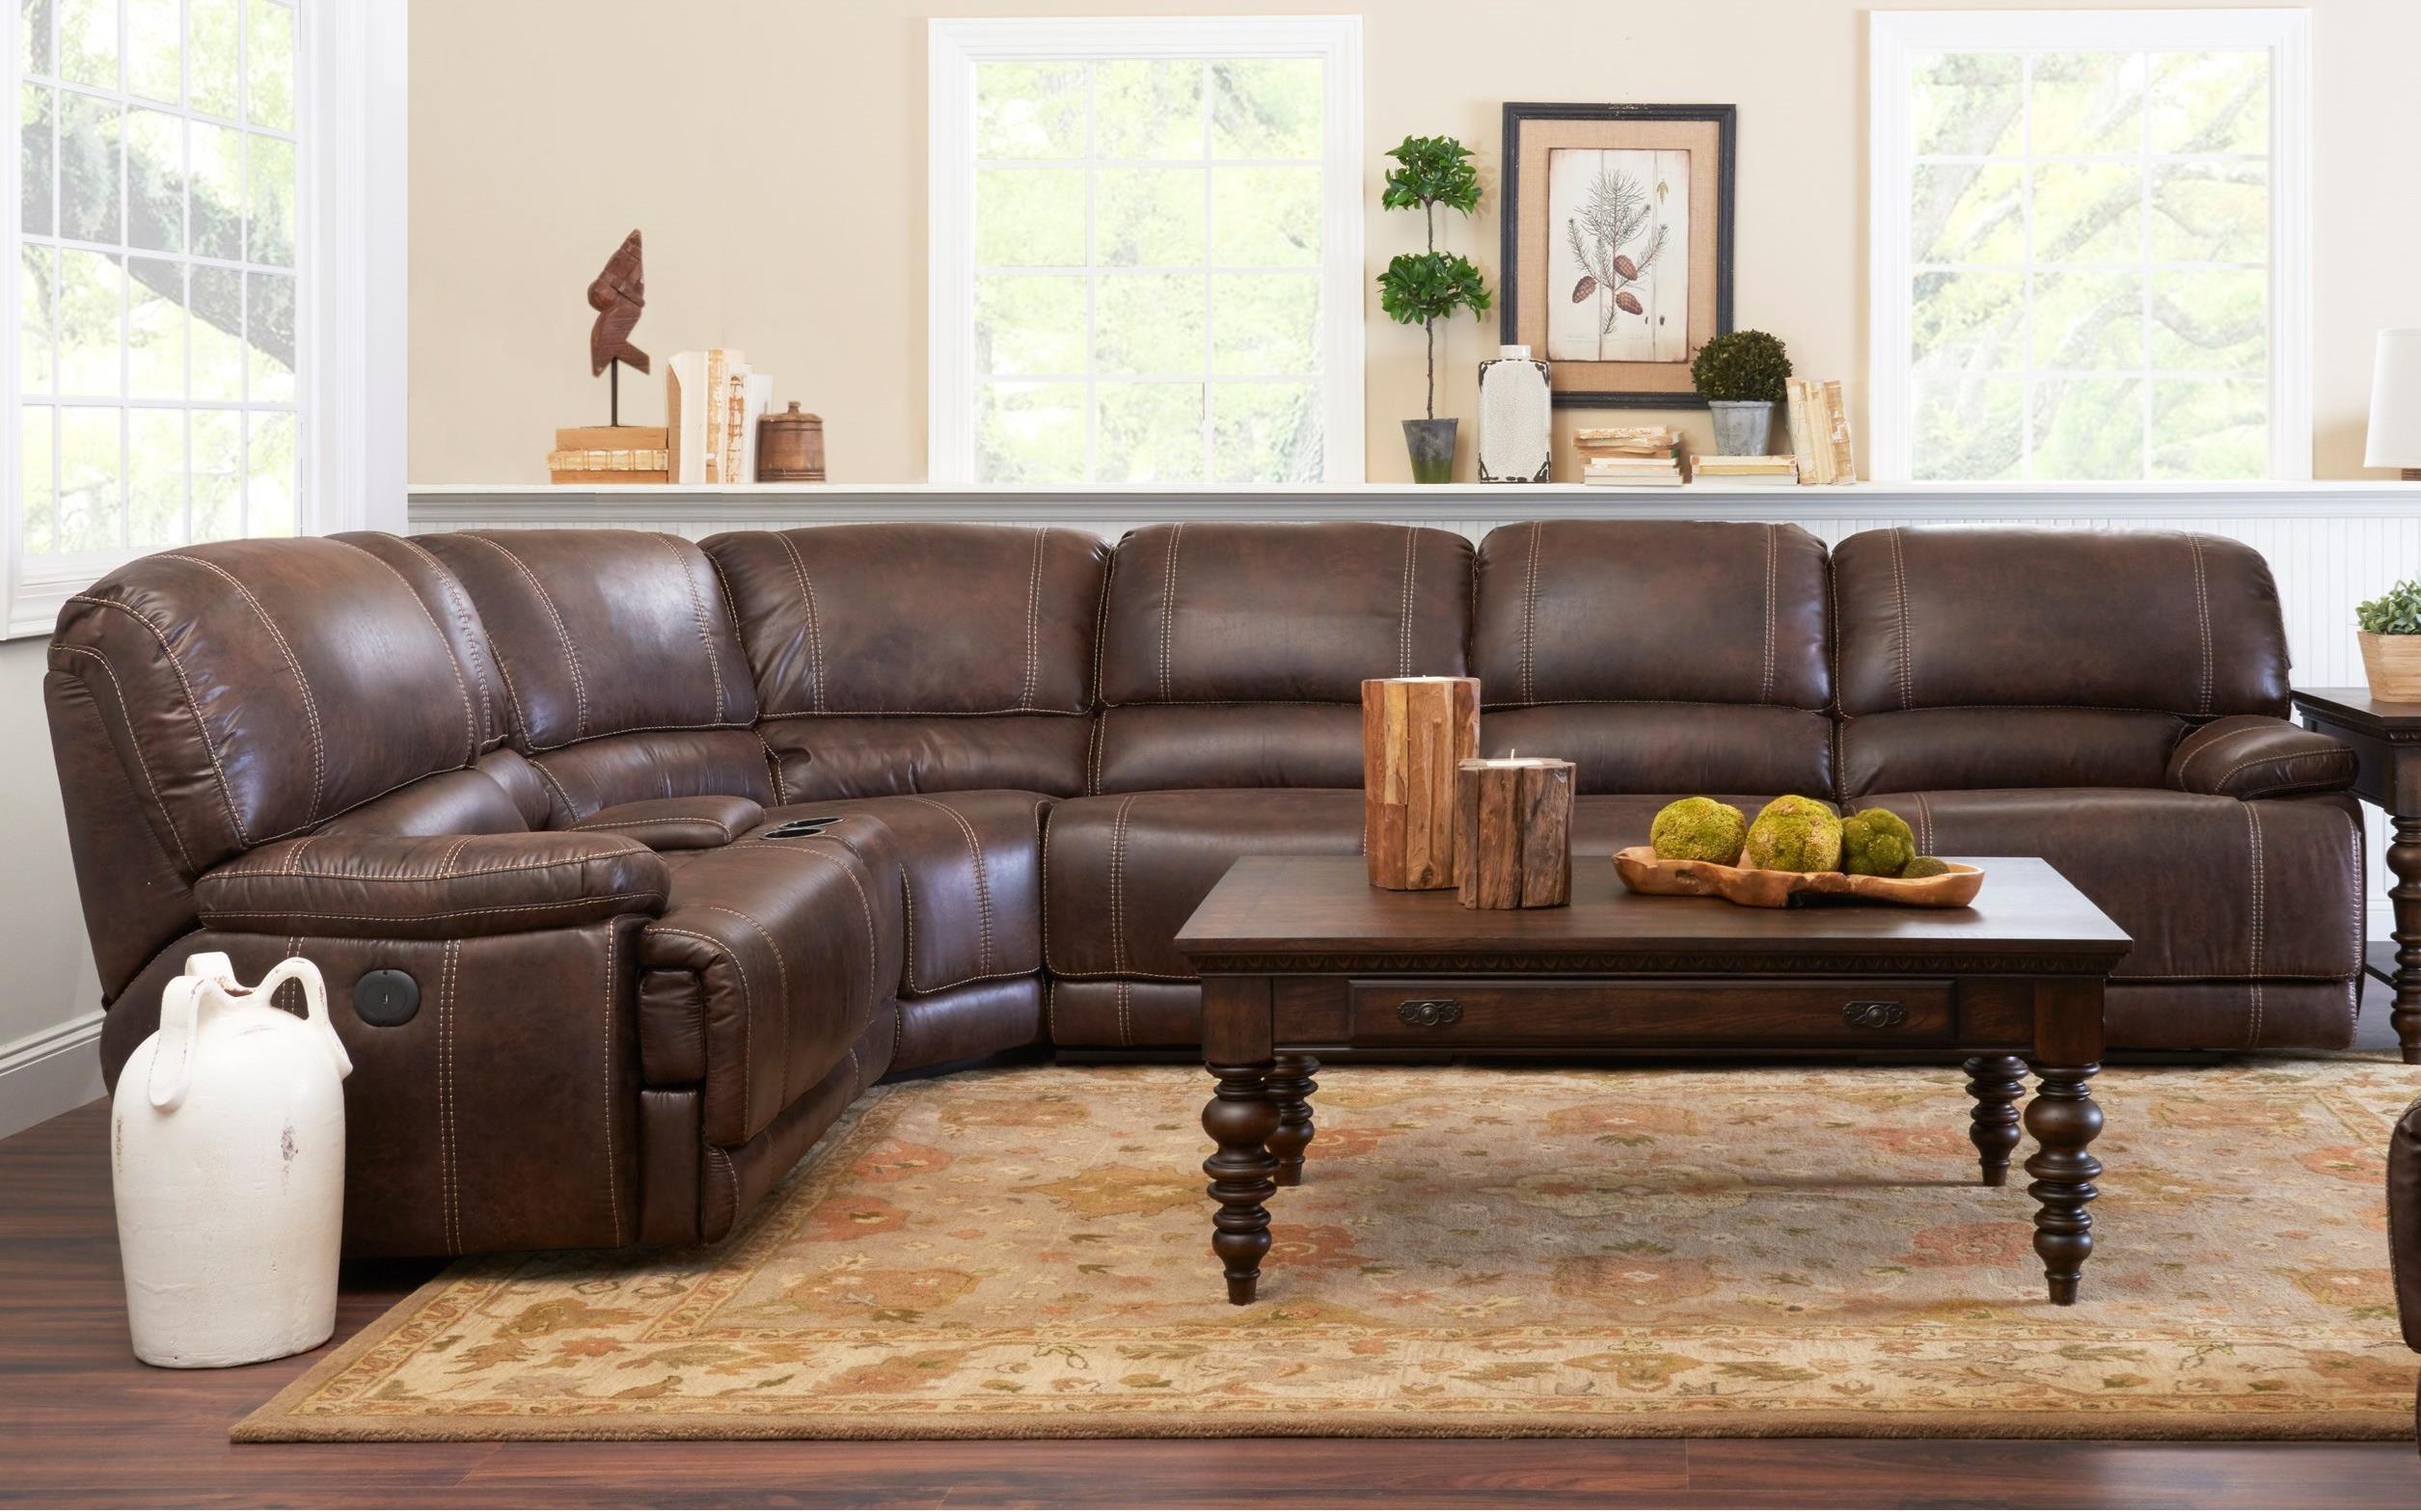 Merveilleux Klaussner International Foster4 Seat Pwr Reclining Sectional Sofa ...